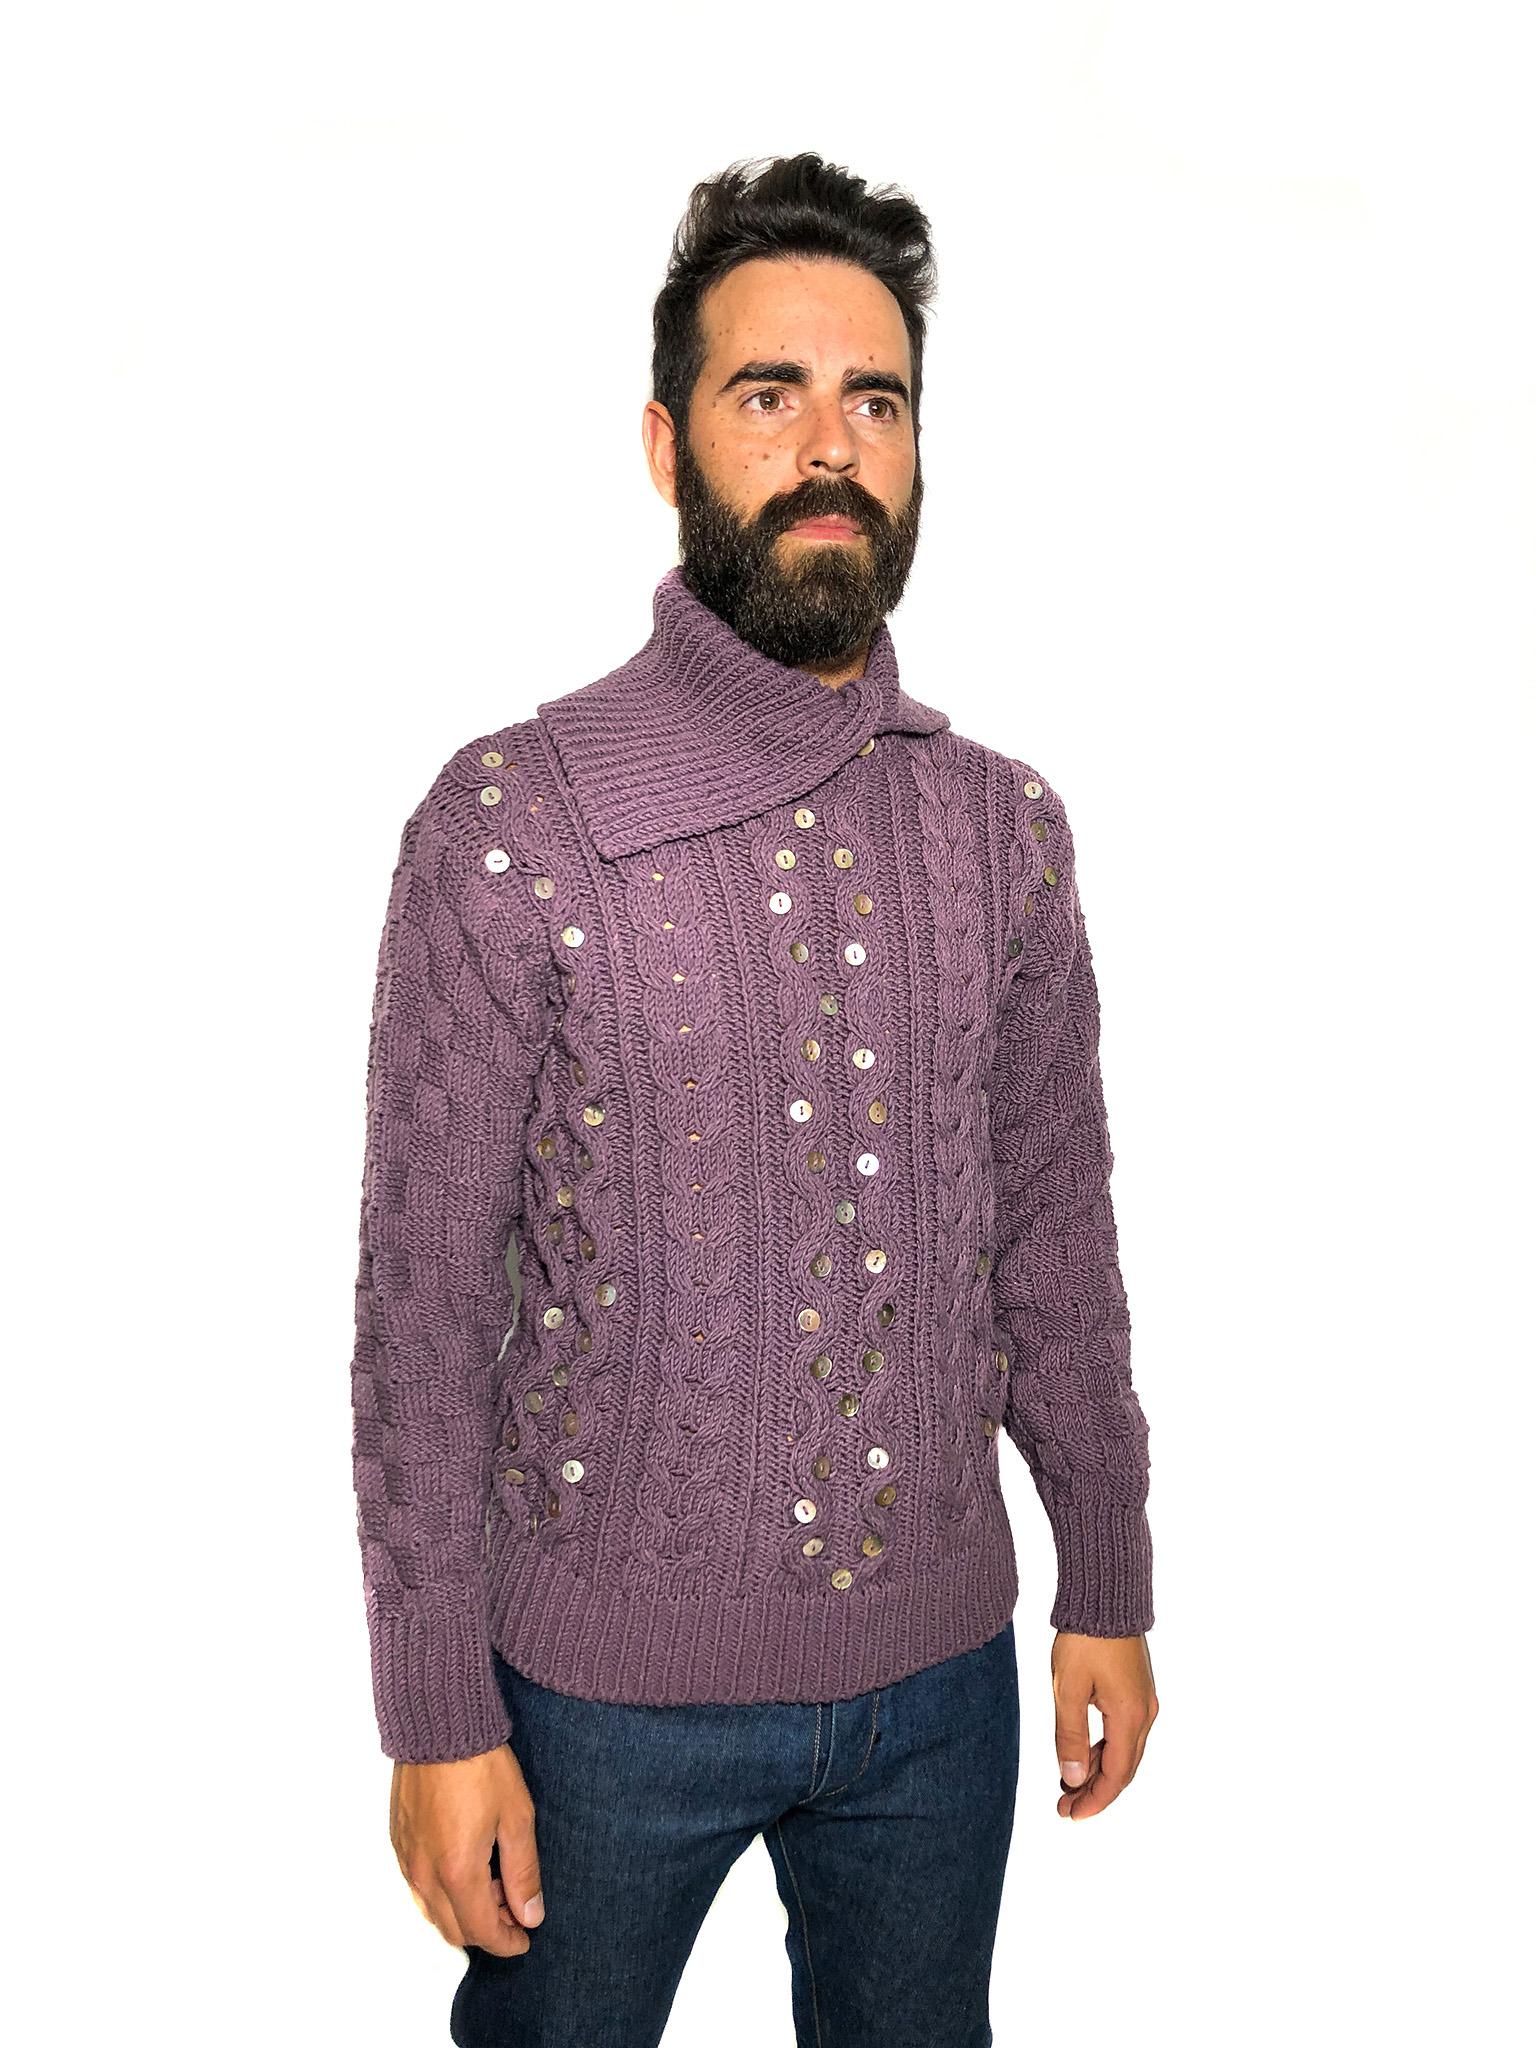 Lavender Wool Jumper